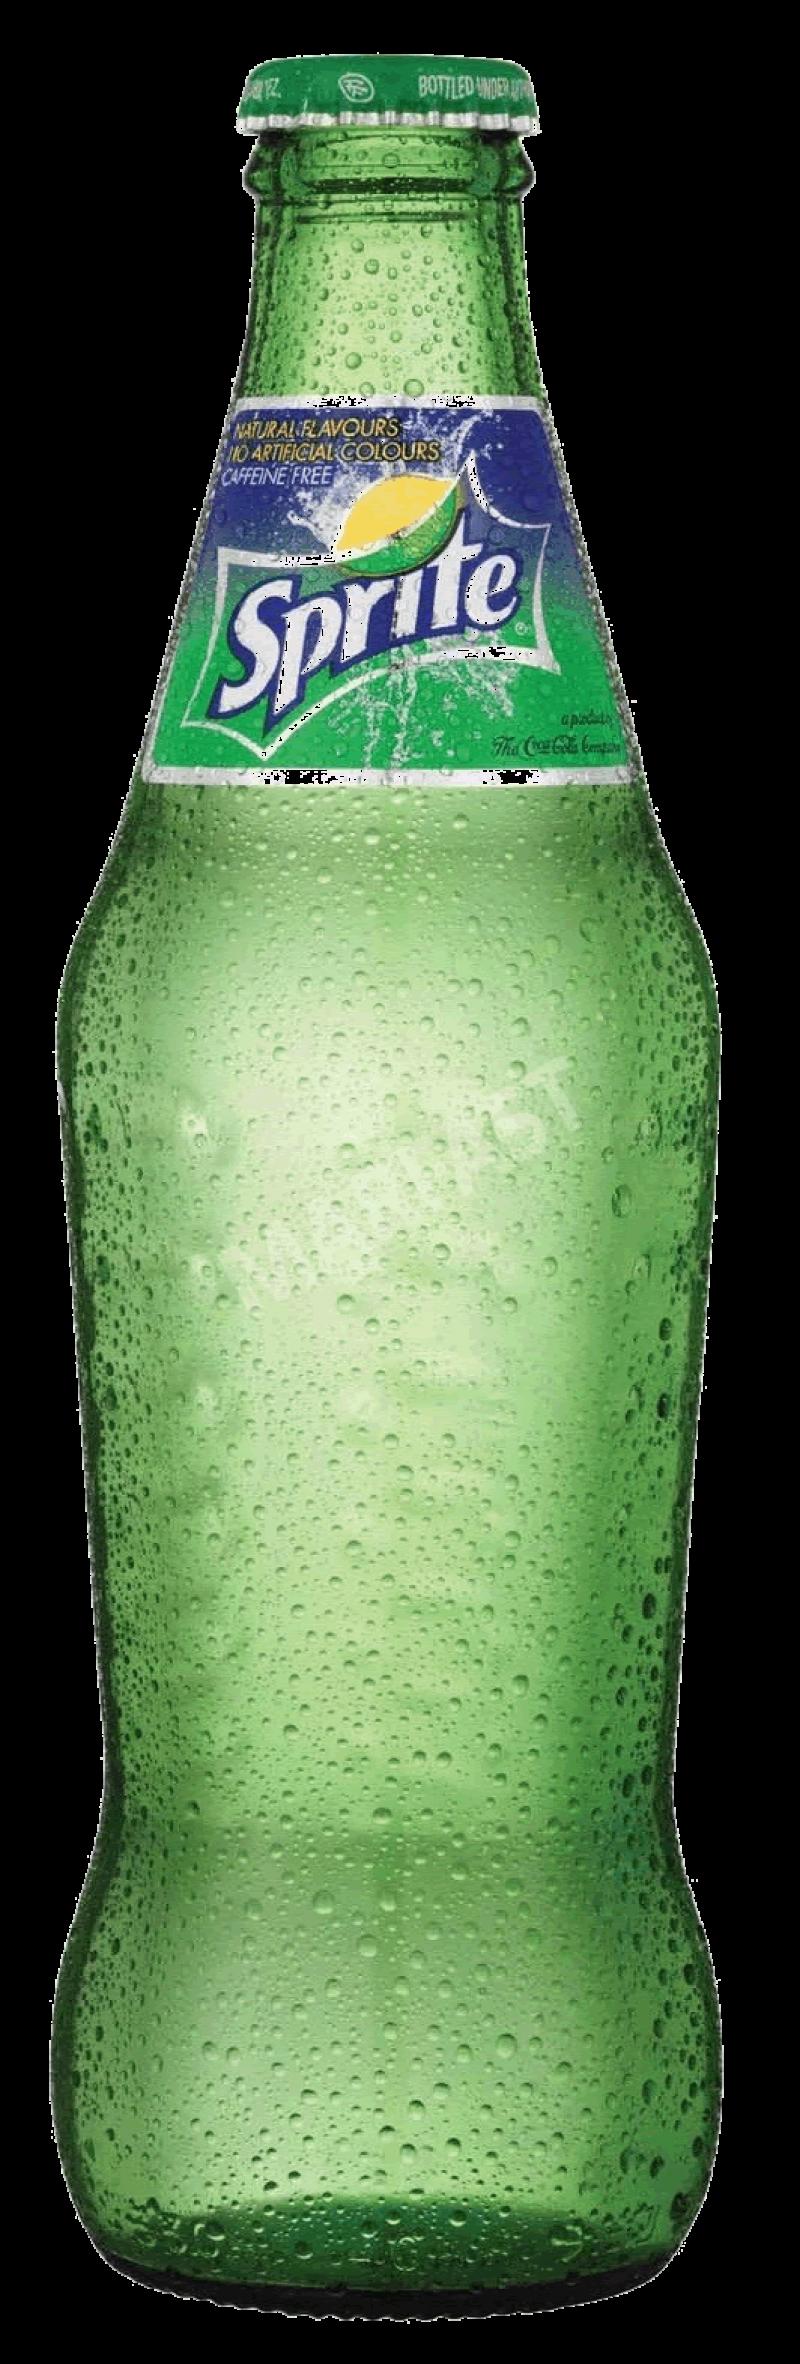 Sprite in a Glas Bottle PNG Image